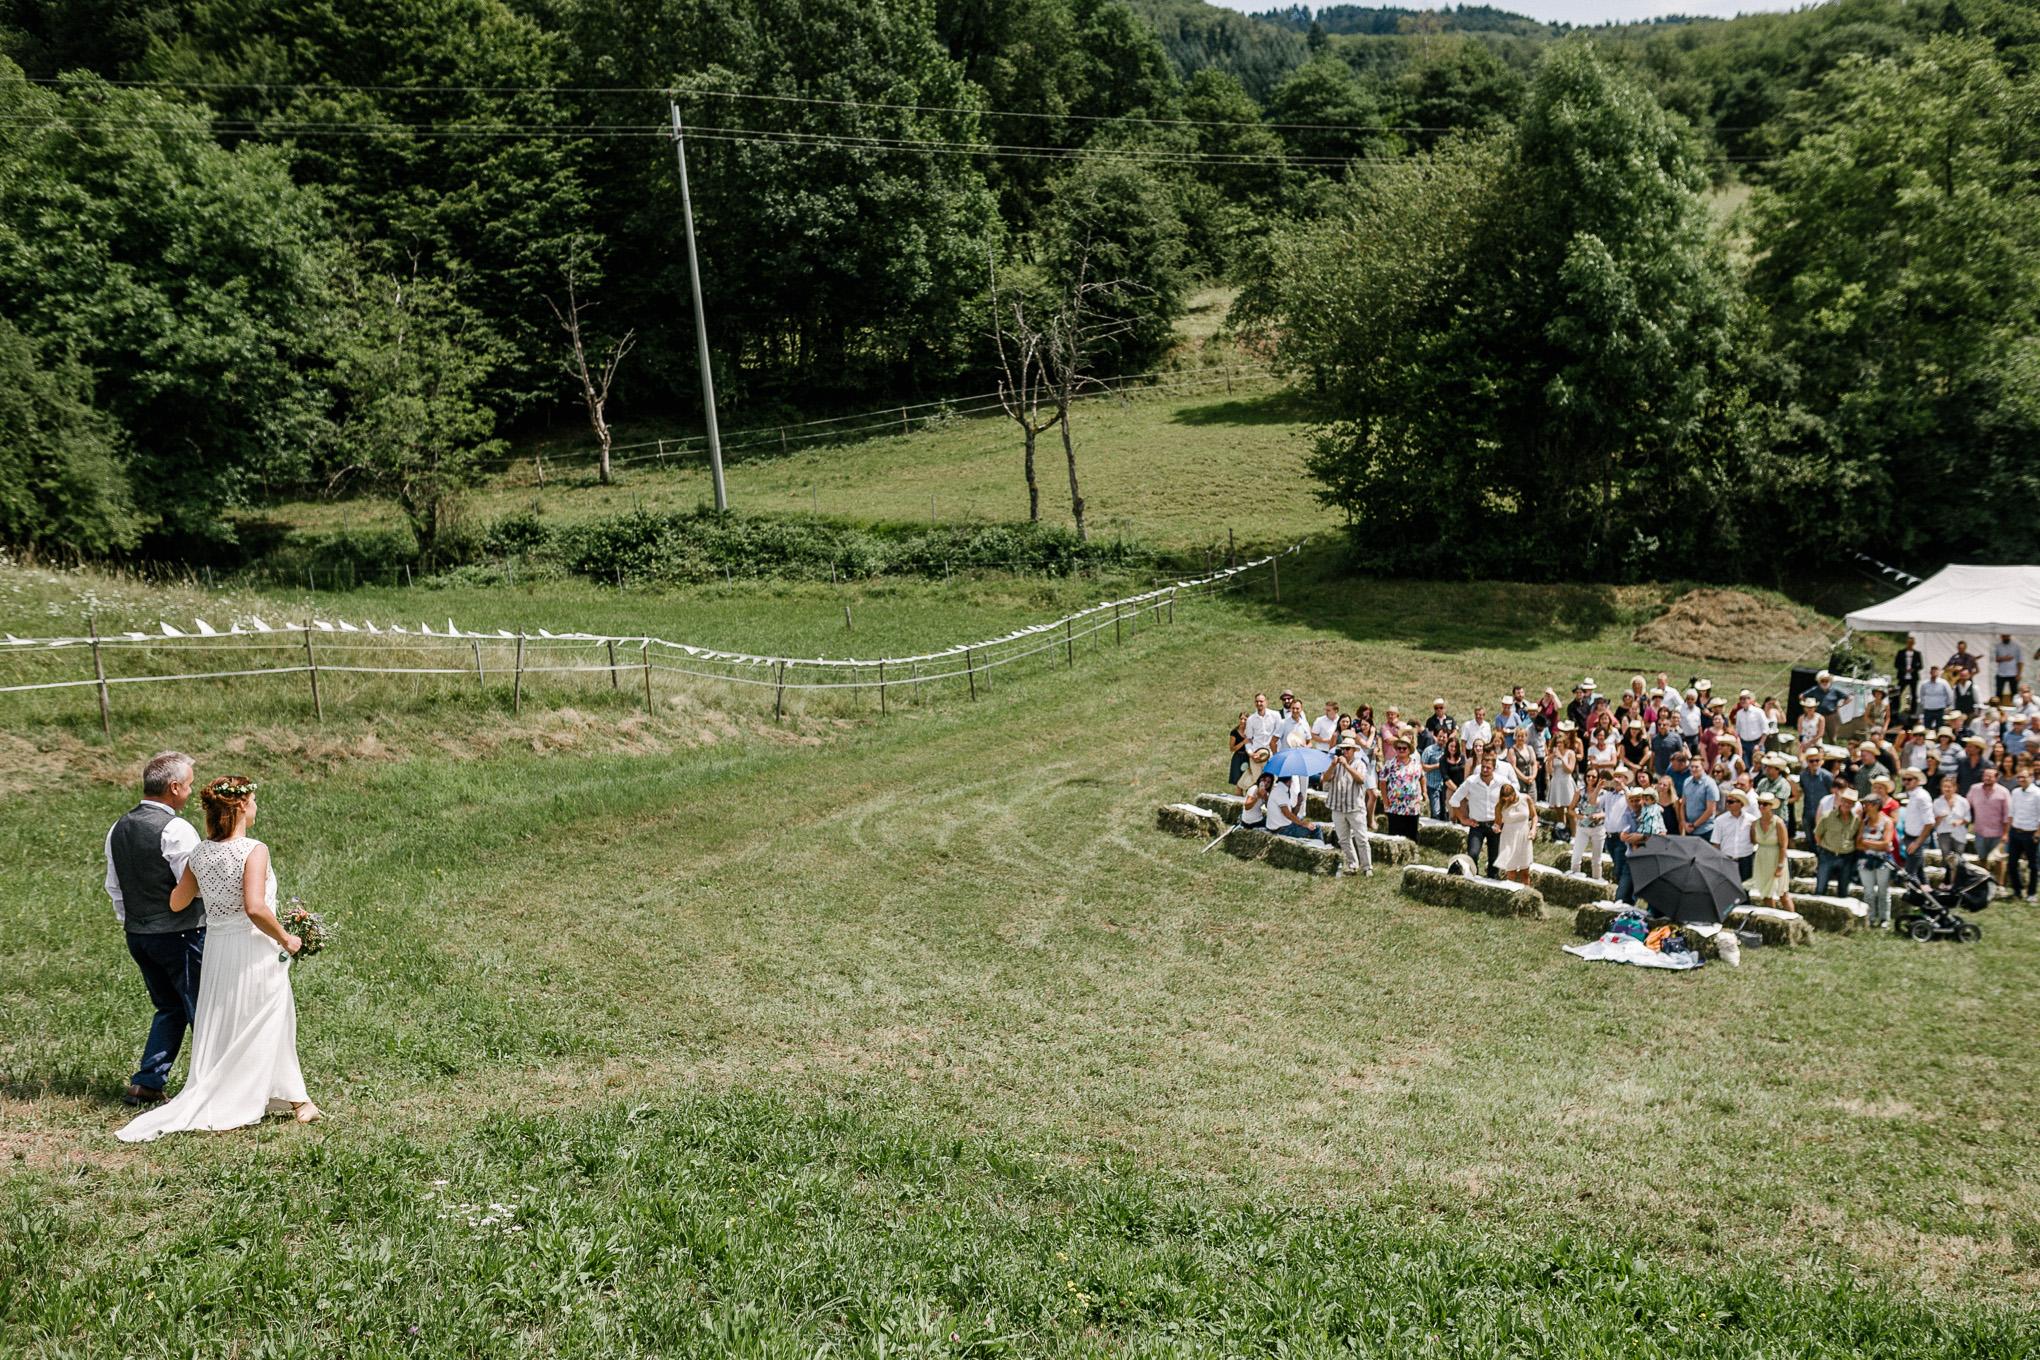 Boho-Scheune-Bauern-Hochzeit-Lörrach-Rheinfelden-Pia-Anna-Christian-Photography-NC-28.jpg